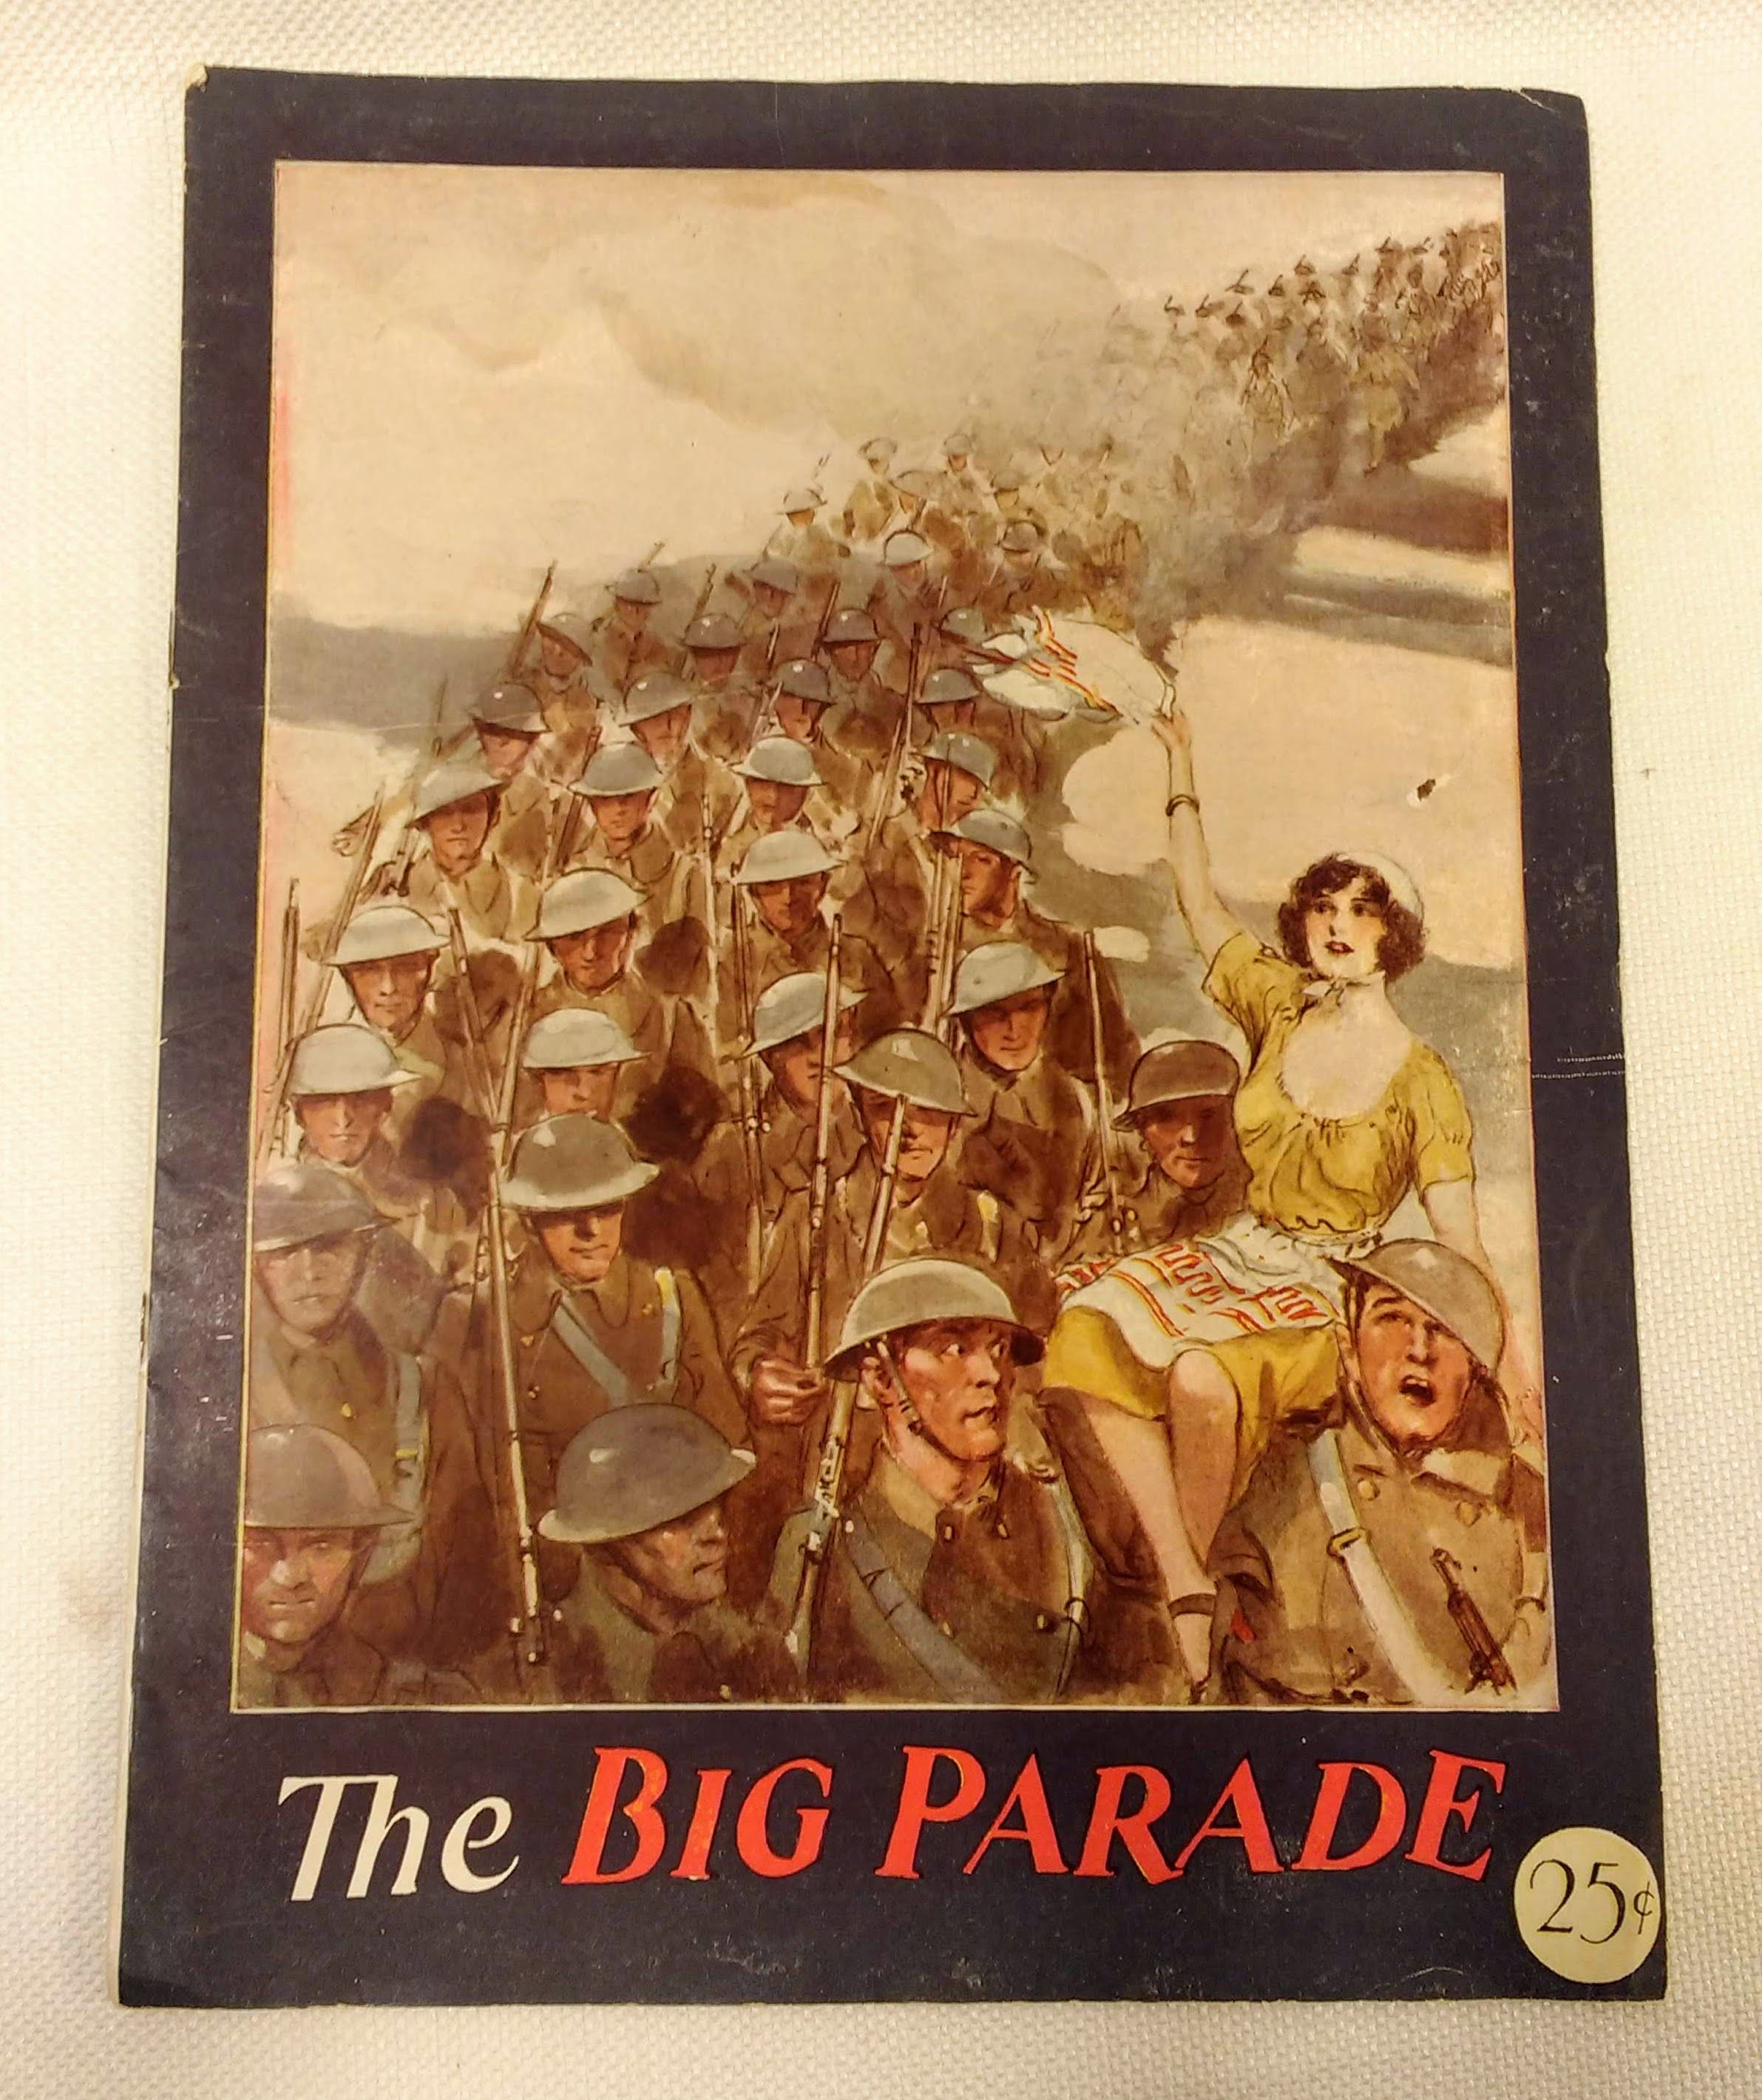 The Big Parade [movie program], Metro-Goldwyn-Mayer